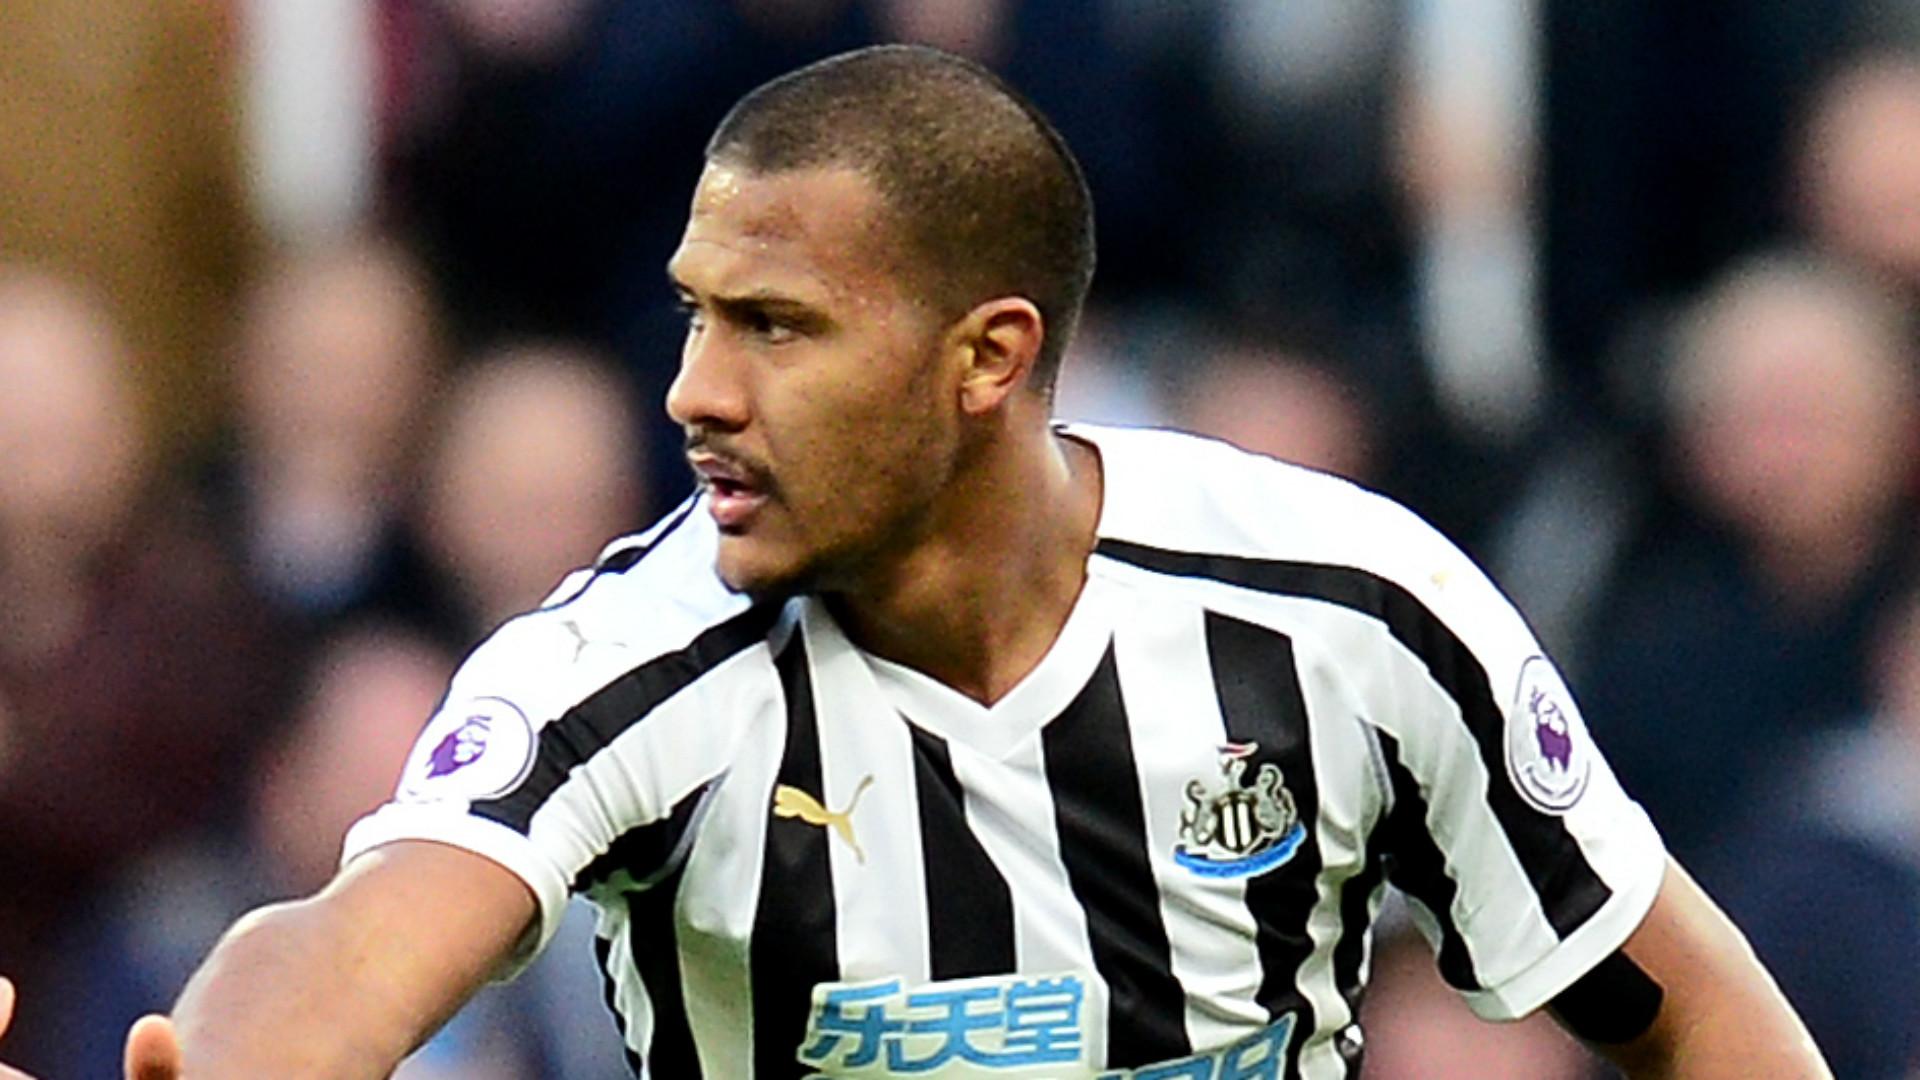 Newcastle 2019 pre-season: Friendlies, transfers, rumours Premier League fixtures